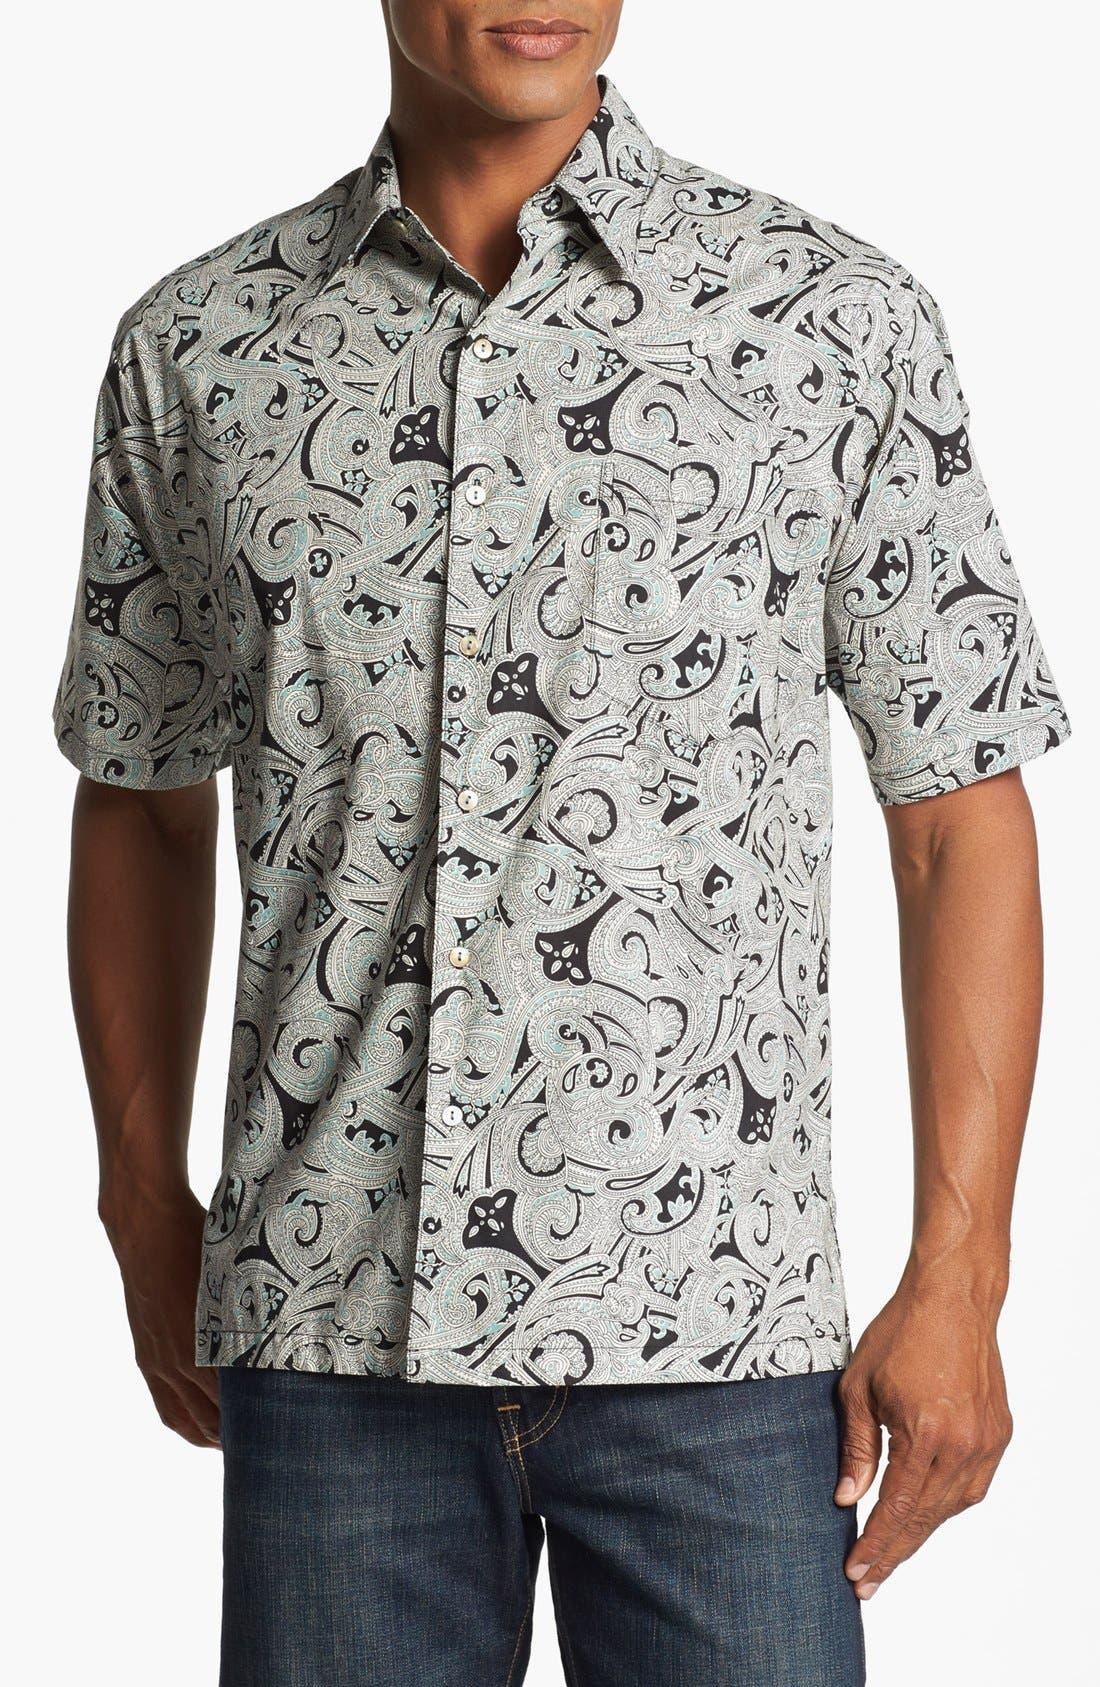 Alternate Image 1 Selected - Tori Richard 'Clockwork' Short Sleeve Sport Shirt